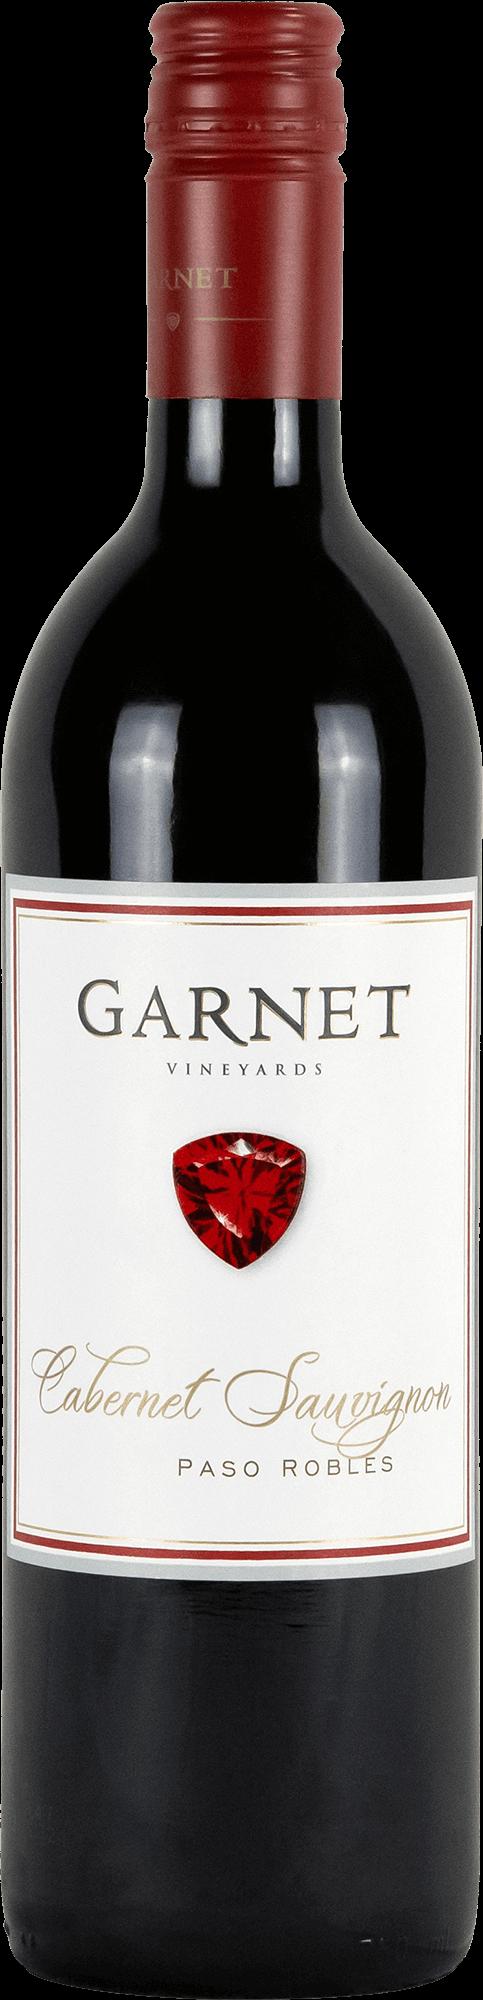 Garnet Vineyards Paso Robles Cabernet Sauvignon Bottleshot